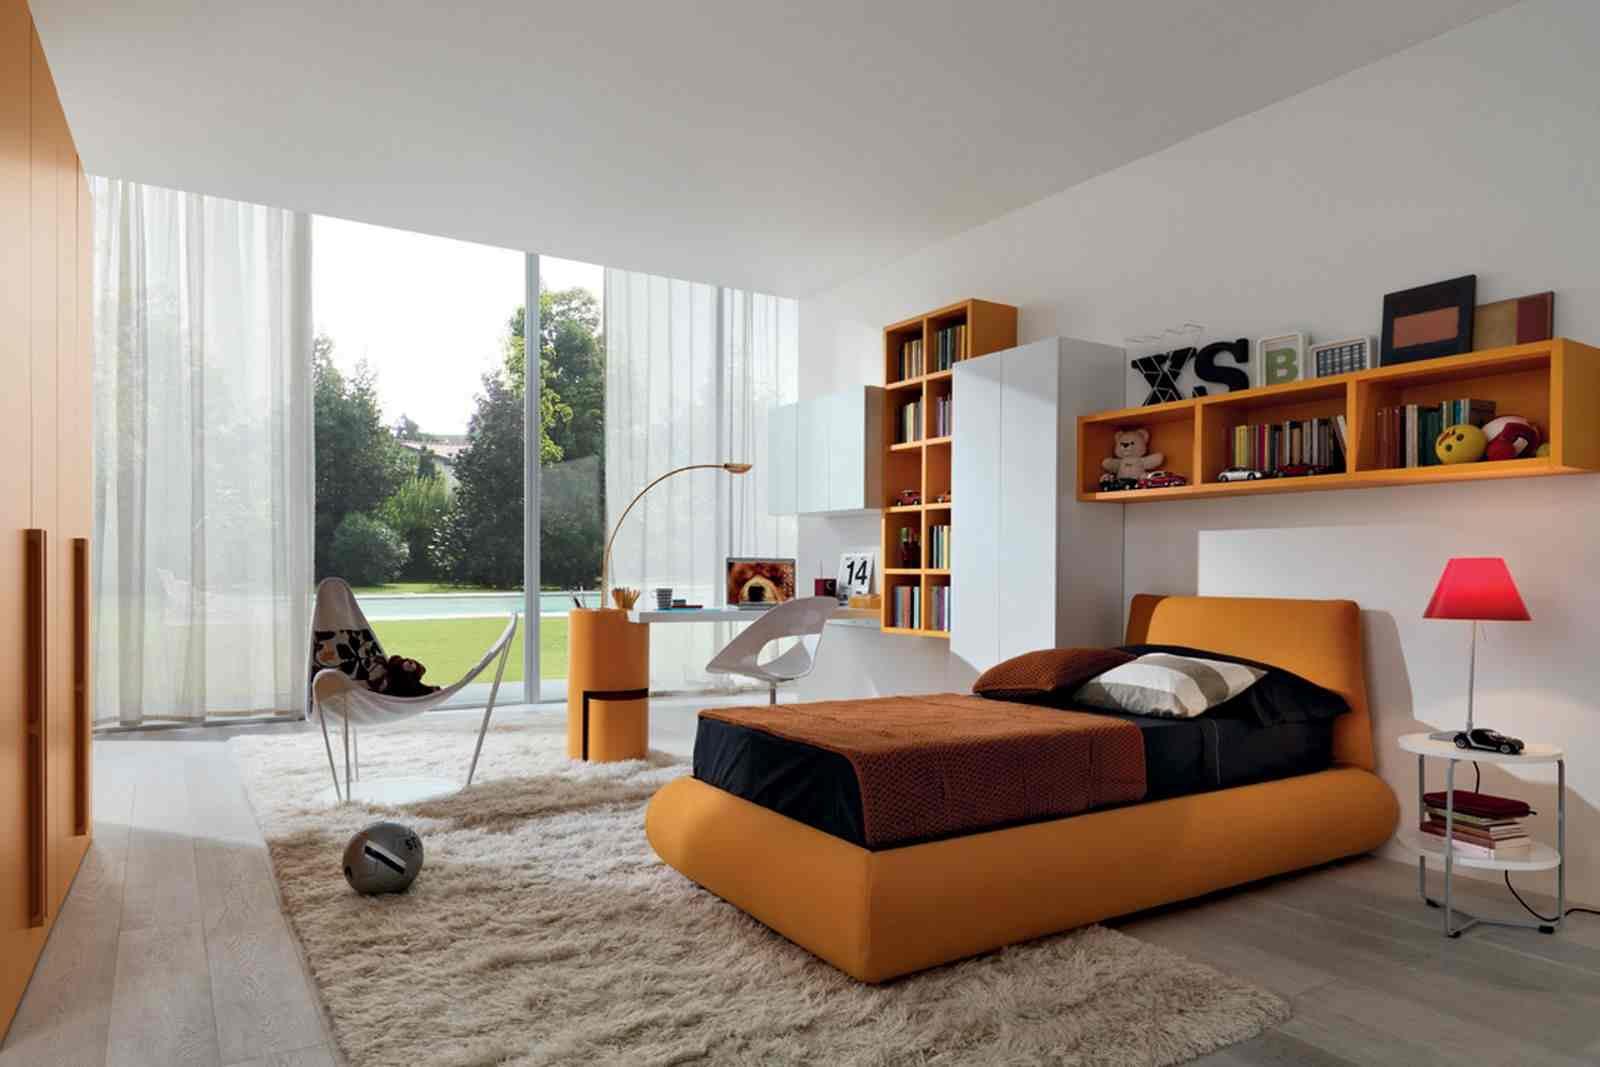 elegant man room design ideas   home and garden ideas - man room